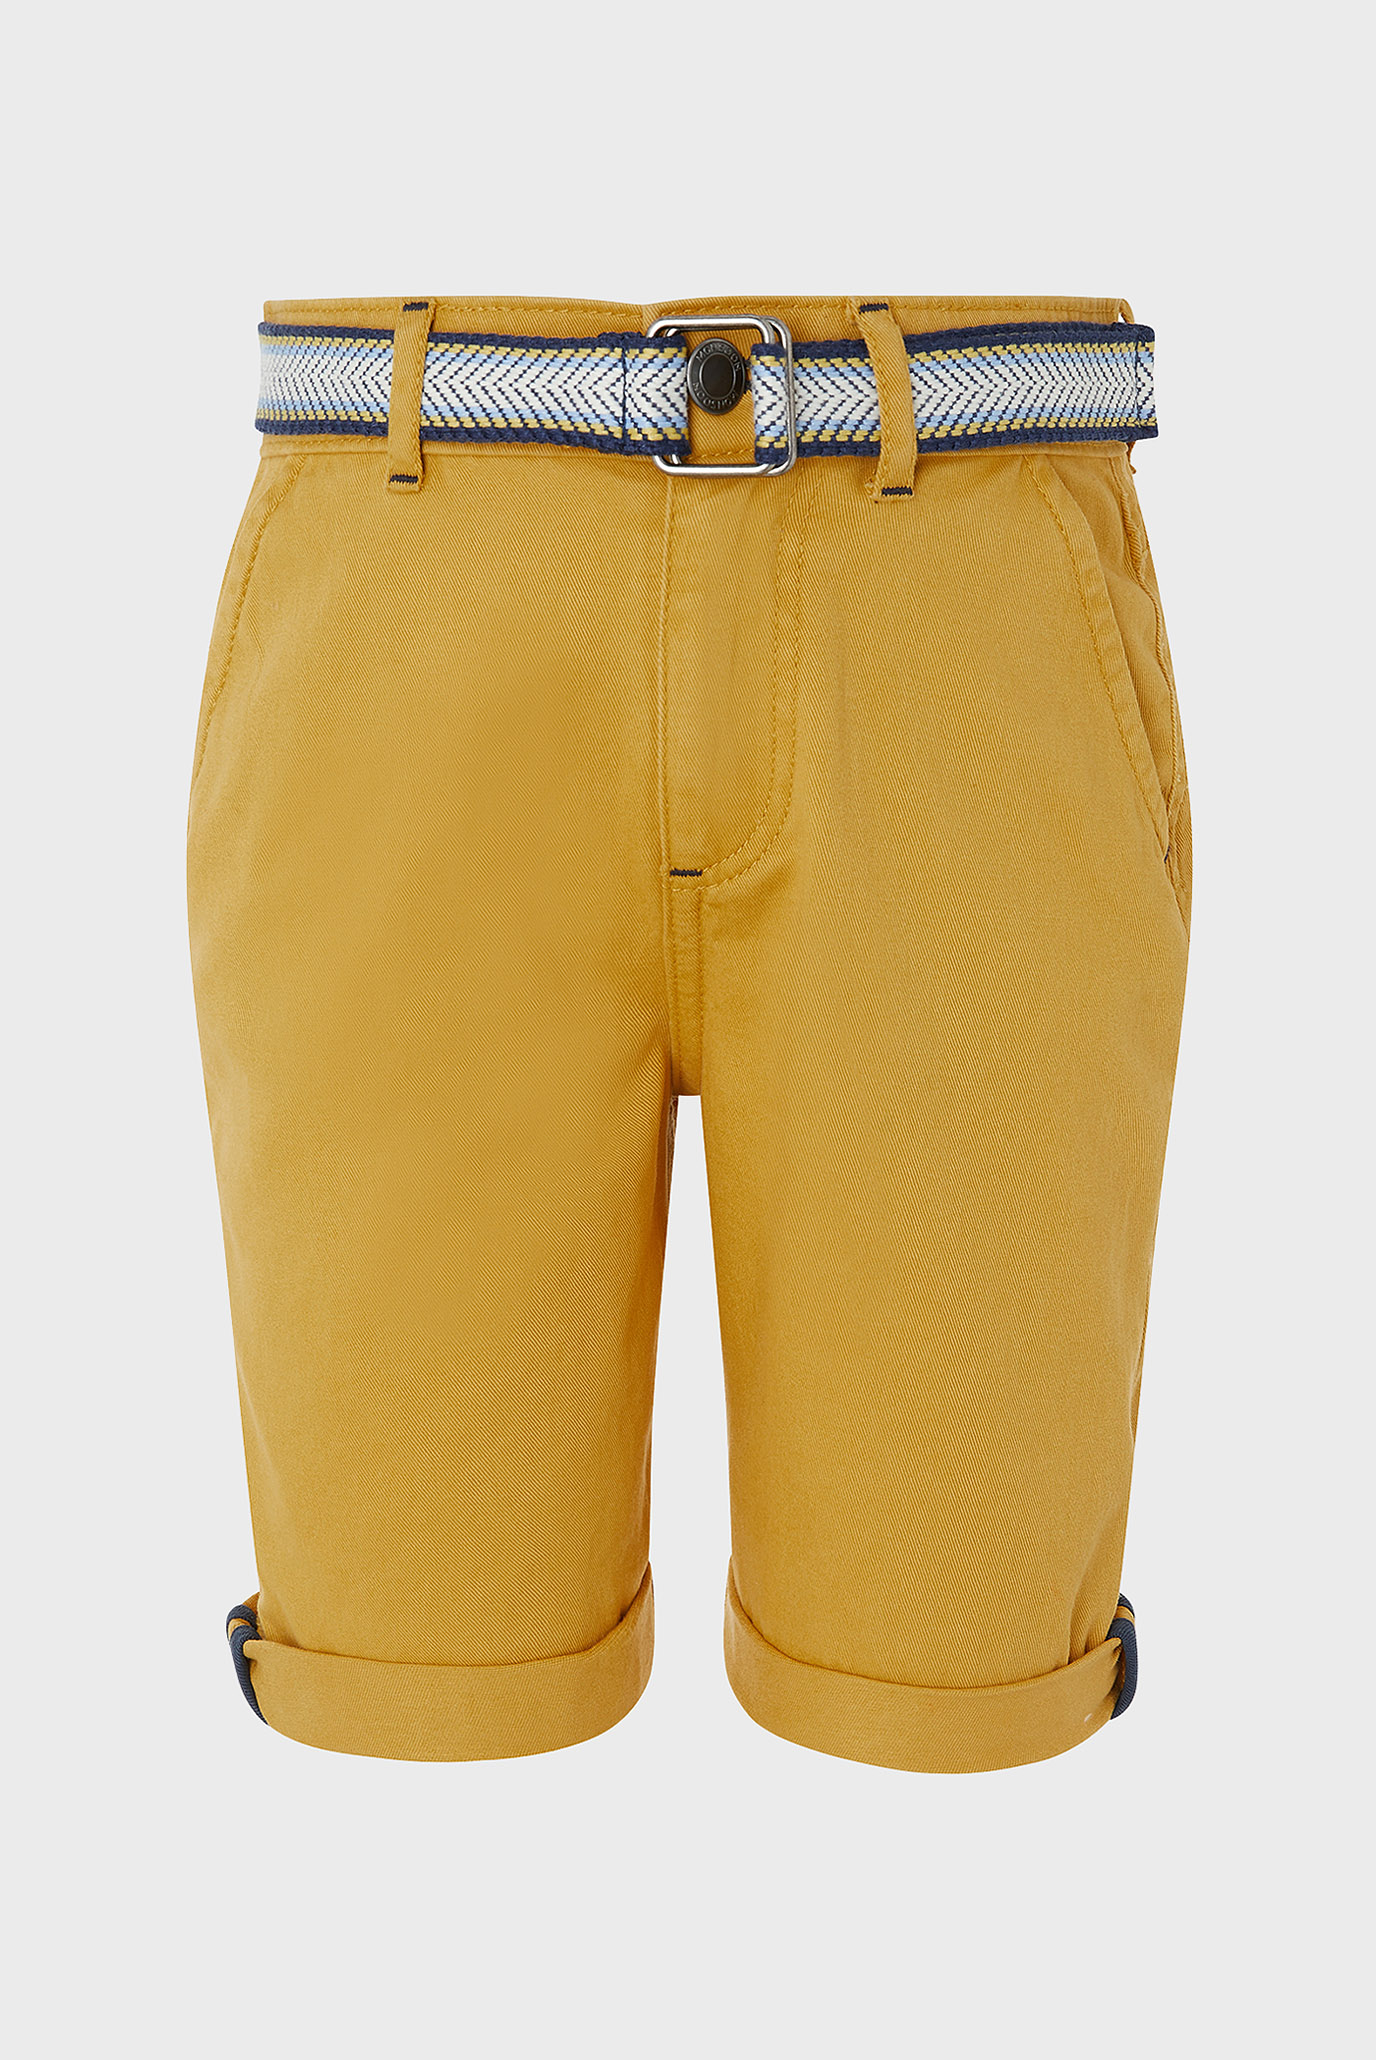 Купить Детские желтые шортыCharlie  Monsoon Children Monsoon Children 616681 – Киев, Украина. Цены в интернет магазине MD Fashion